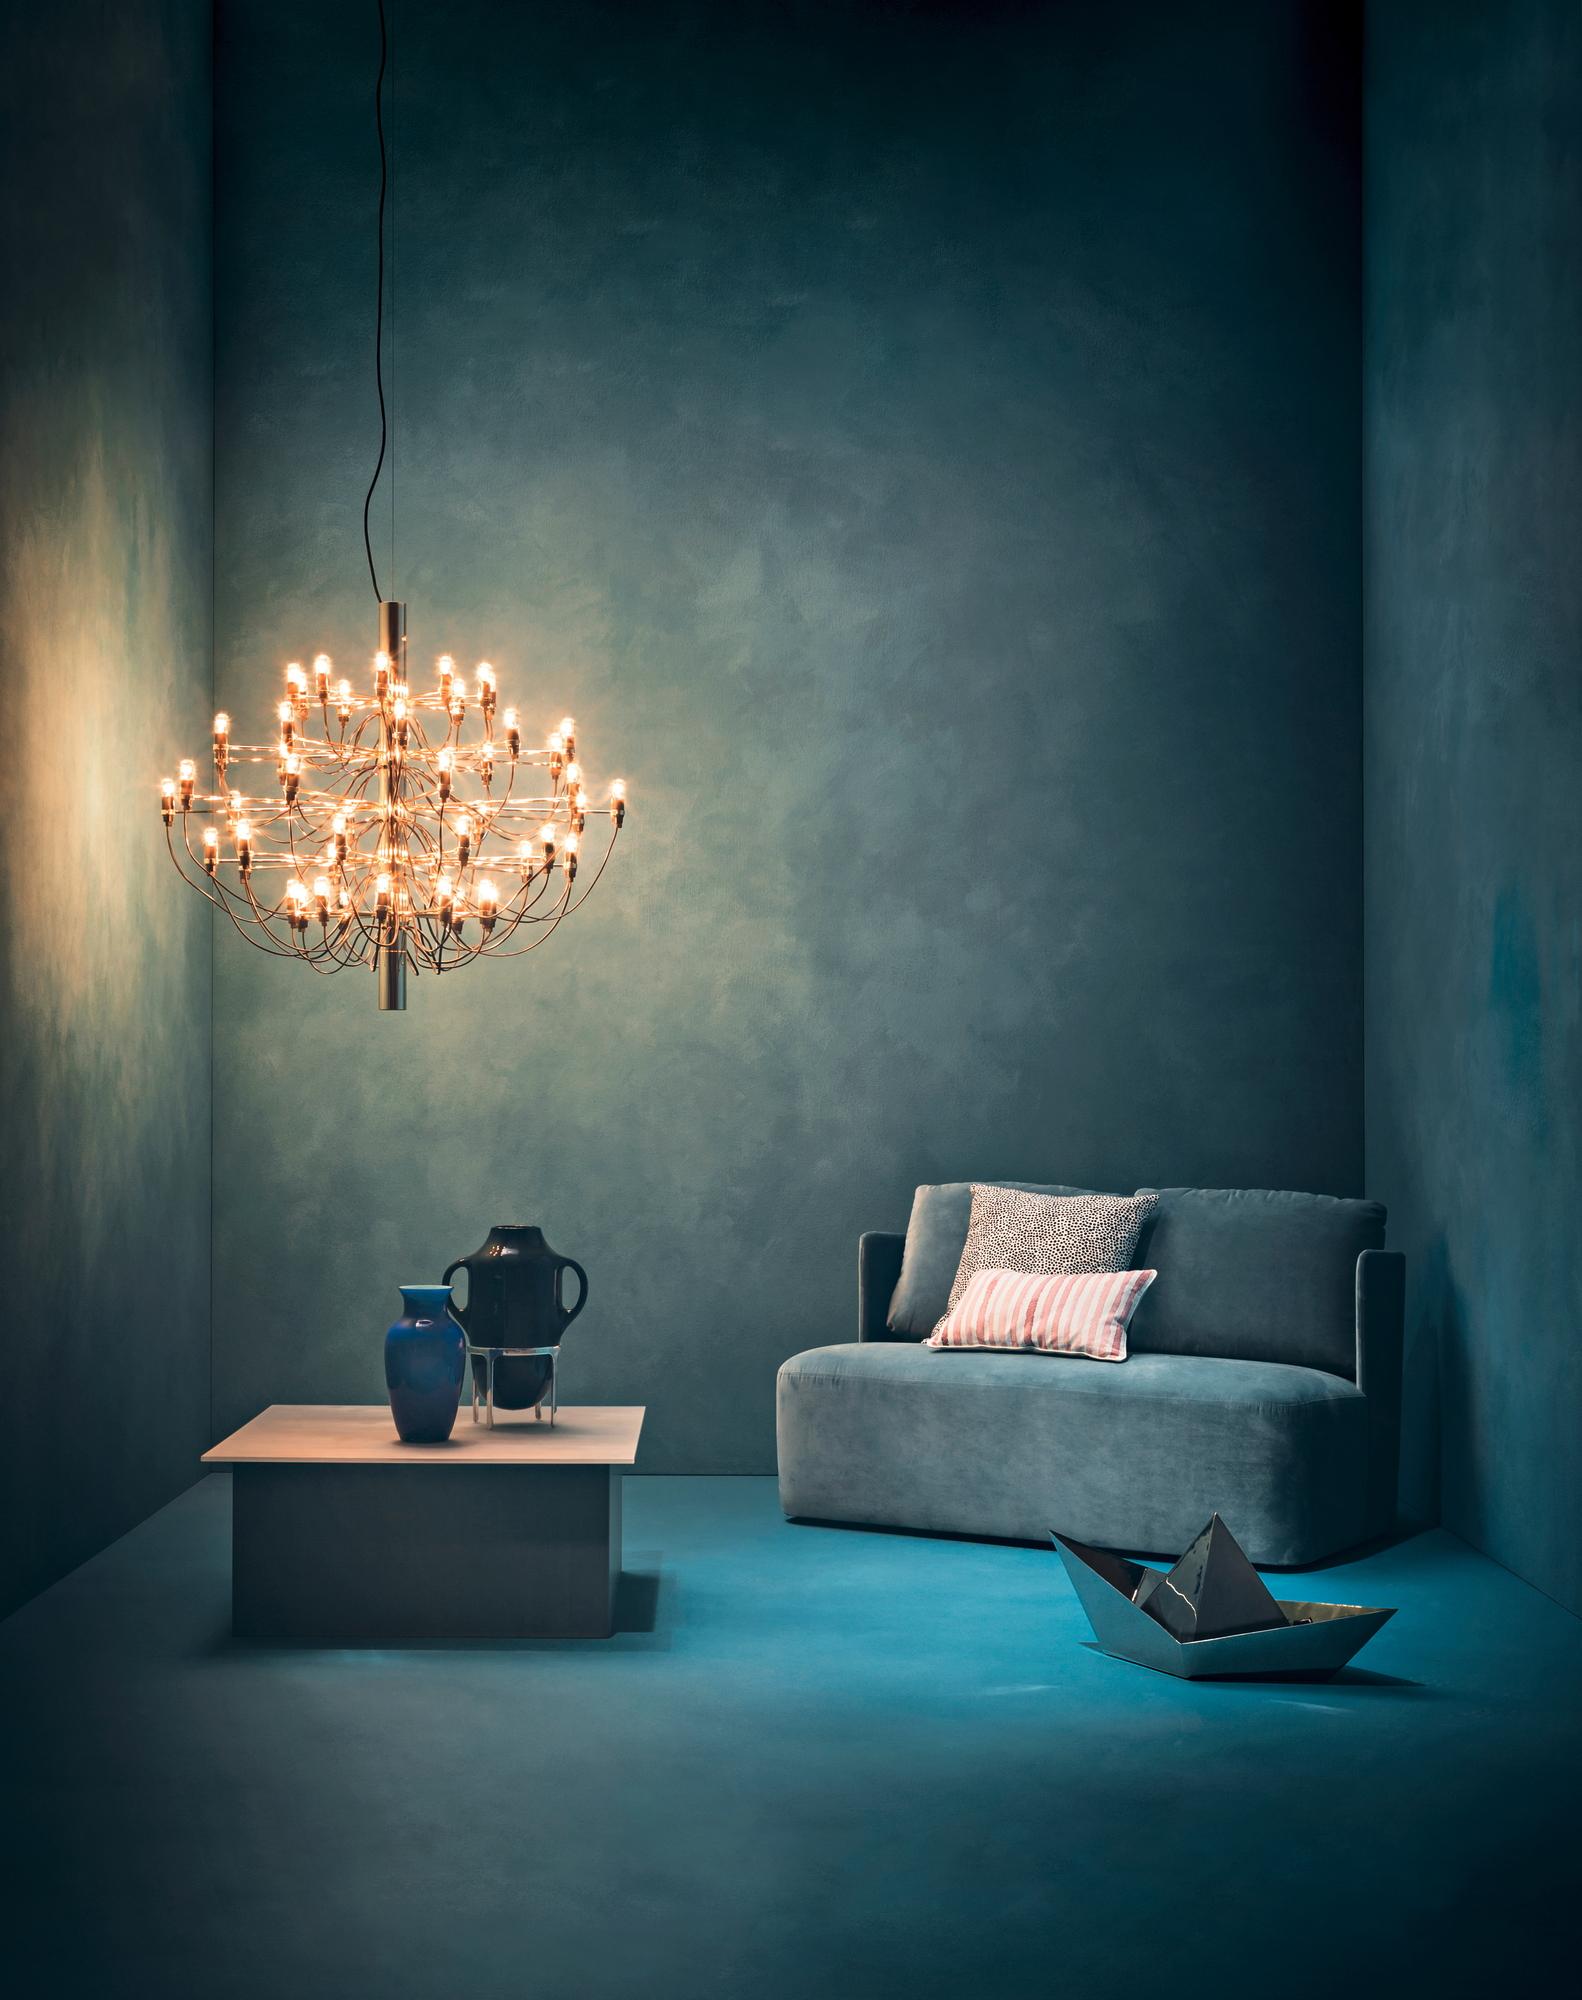 2097 / 30 Pendelleuchte LED Flos Messing